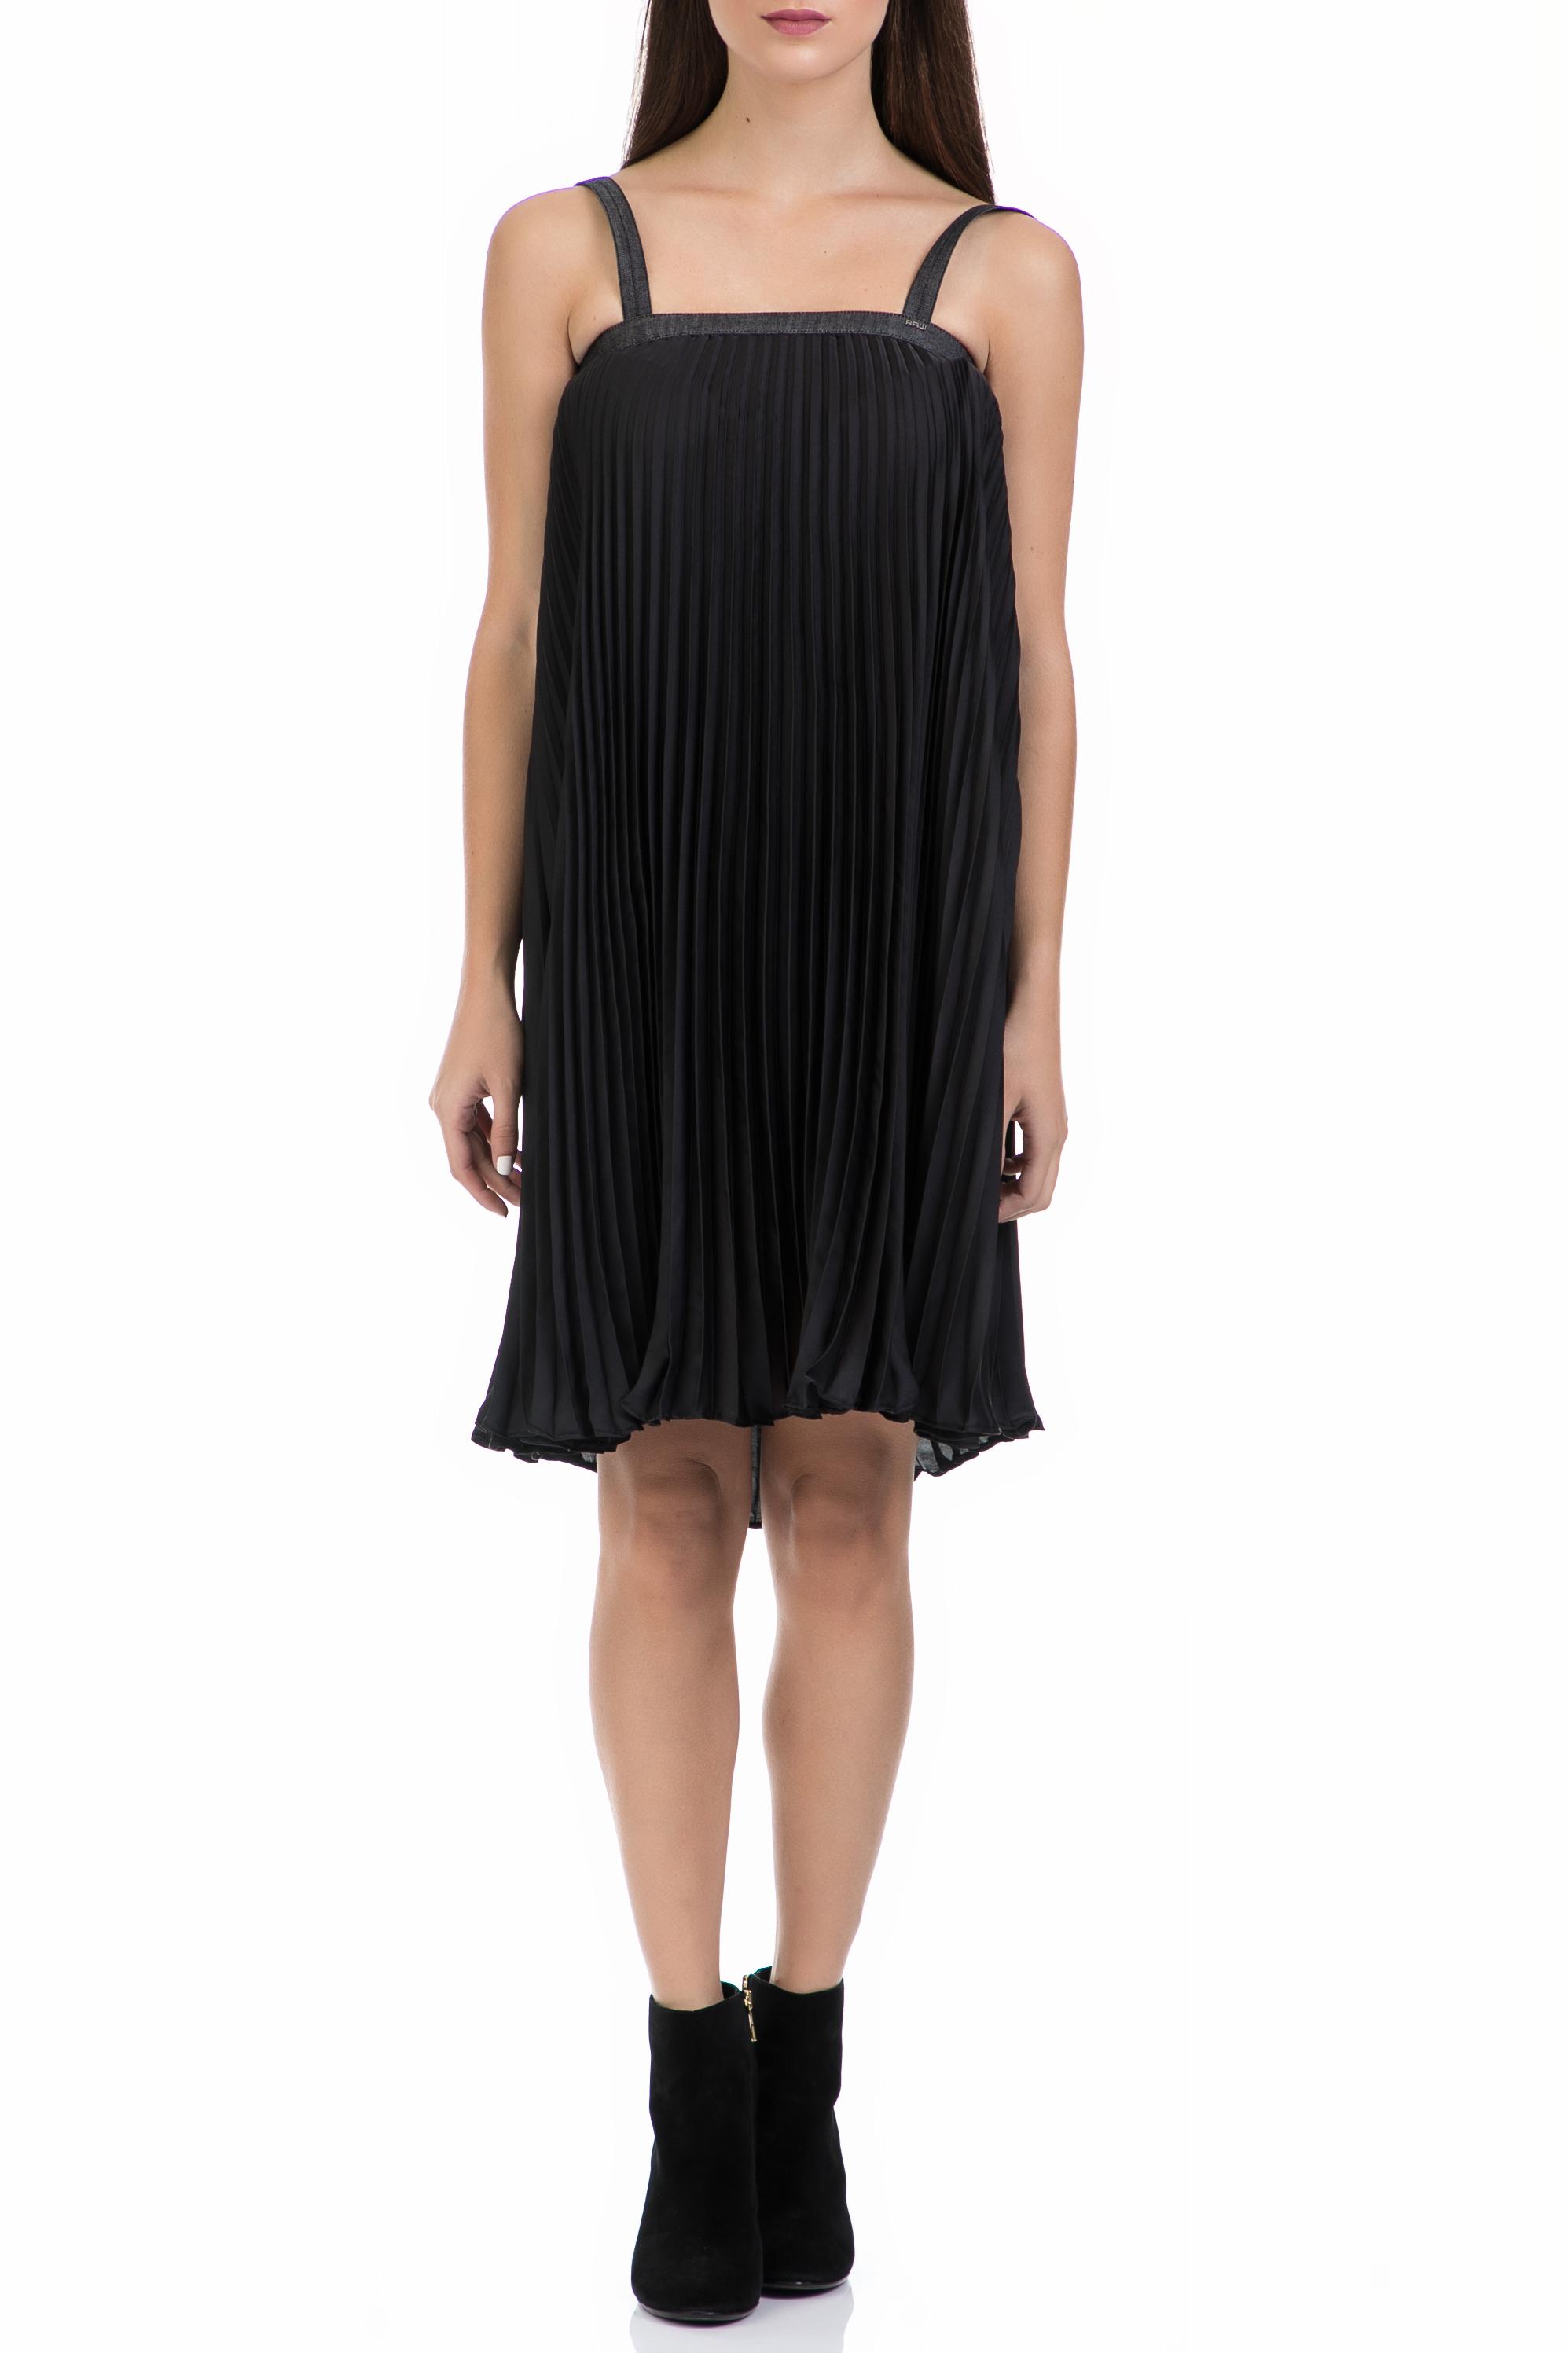 G-STAR - Φόρεμα G-STAR RAW μαύρο γυναικεία ρούχα φορέματα μίνι